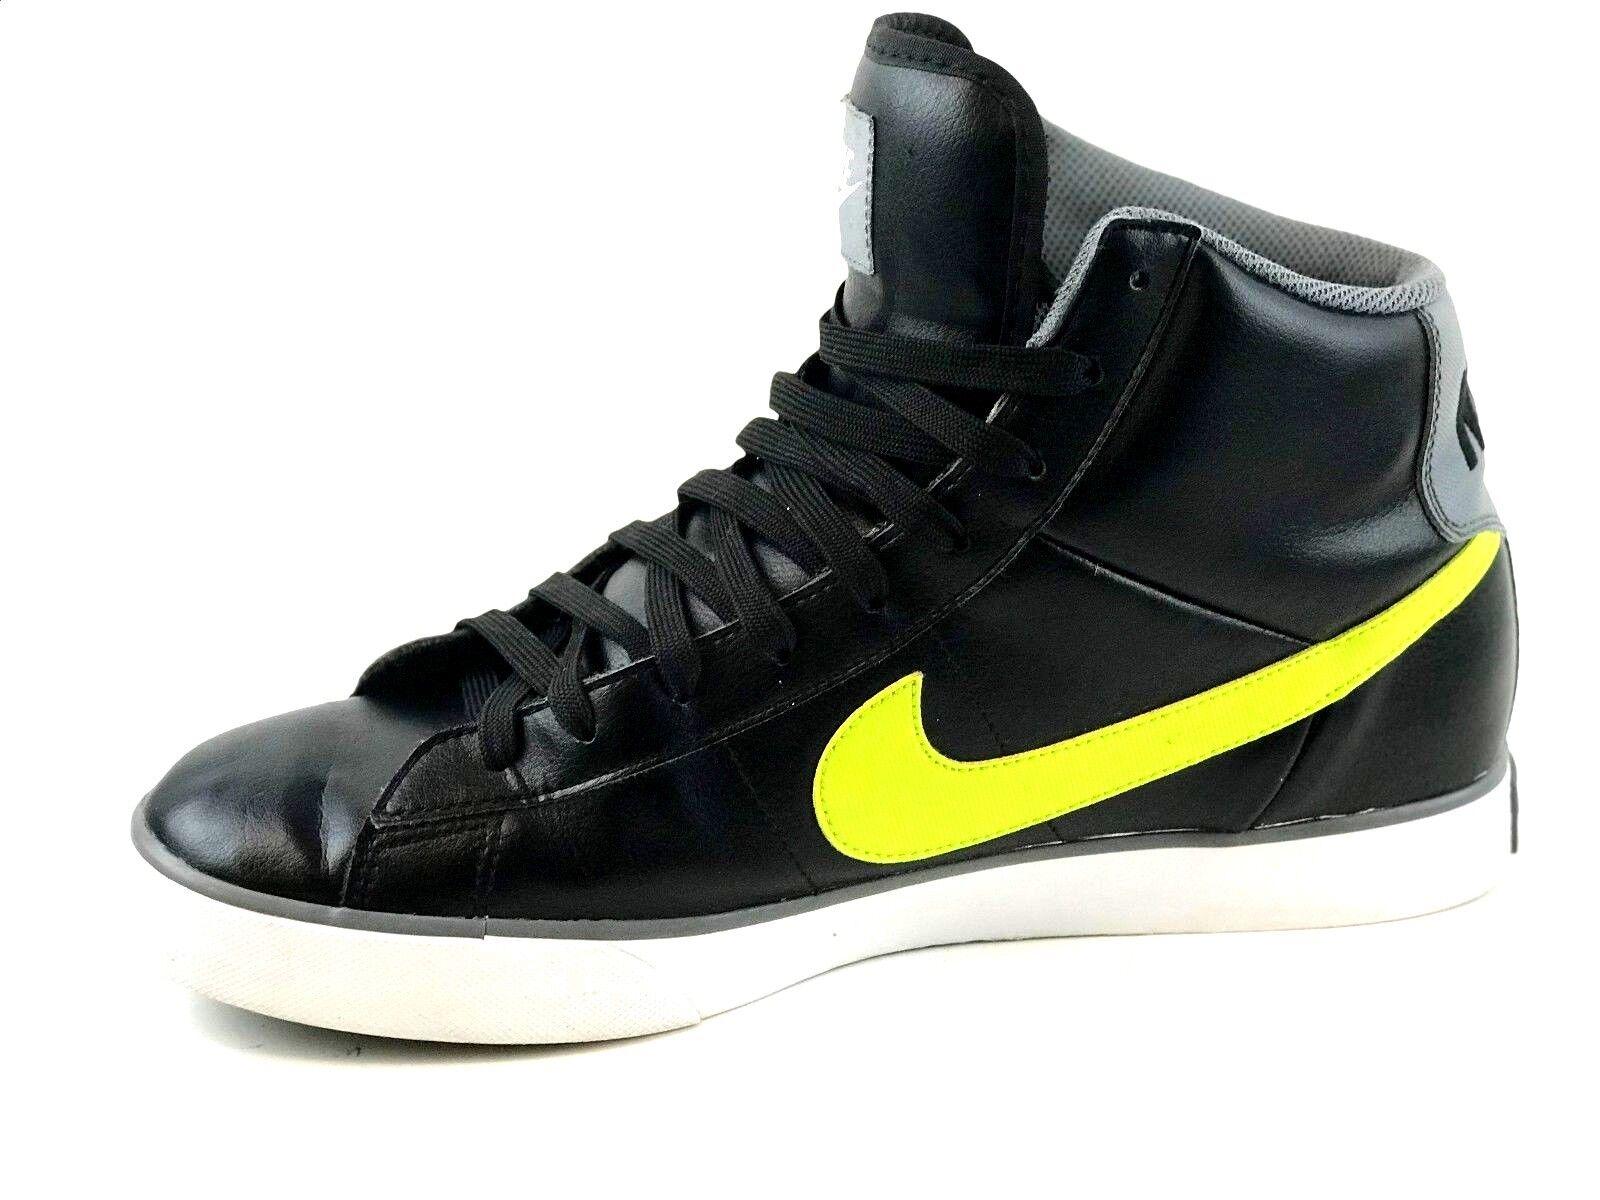 NIKE Men's Athletic Sneakers Black Size US.12 / EUR.46 /  UK.11